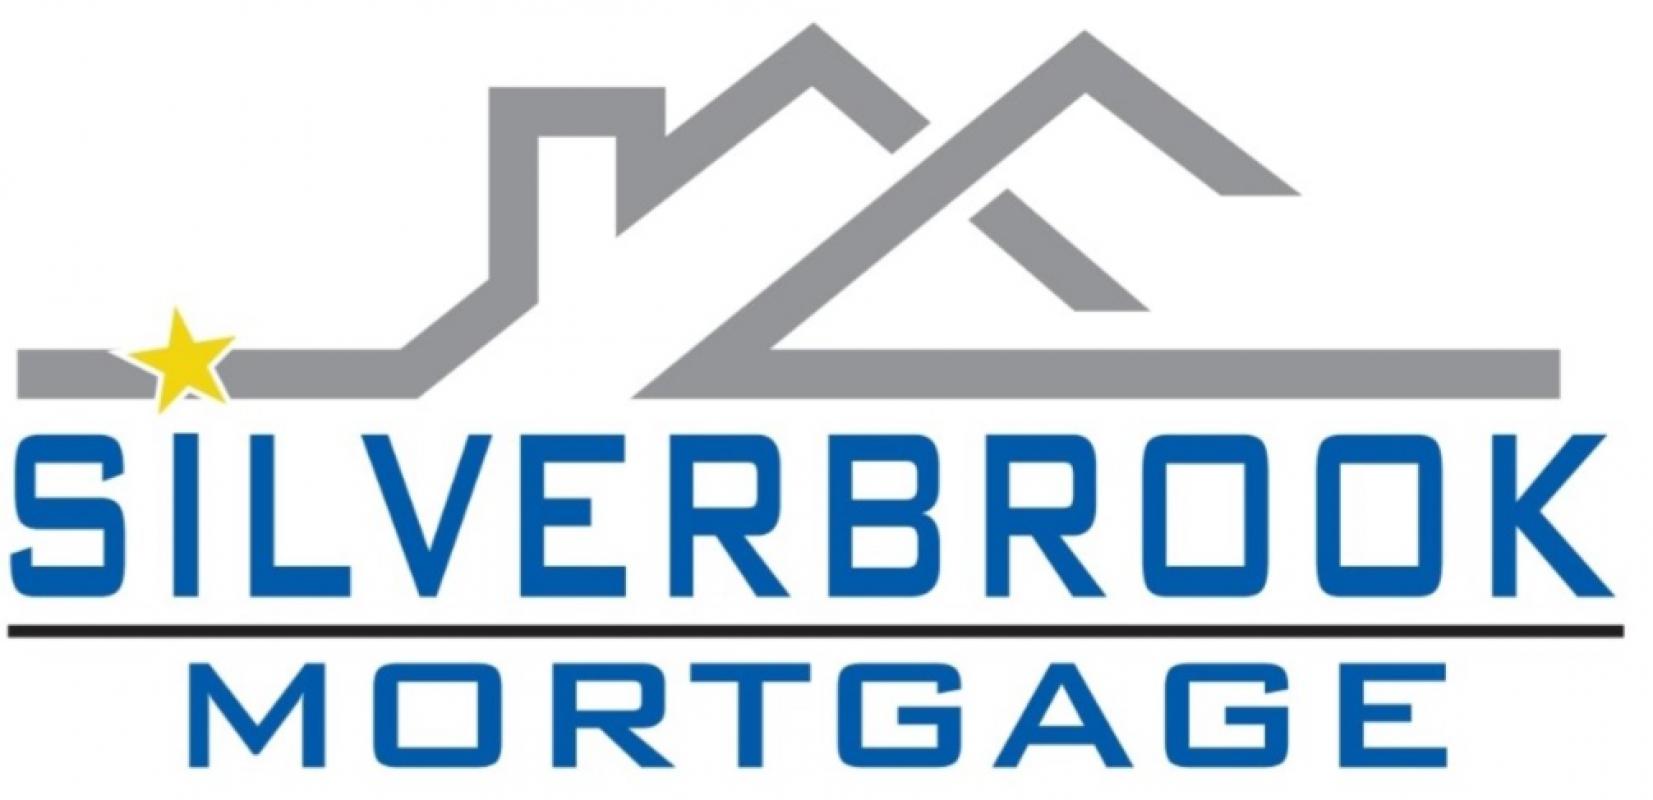 Silverbrook Mortgage LLC logo